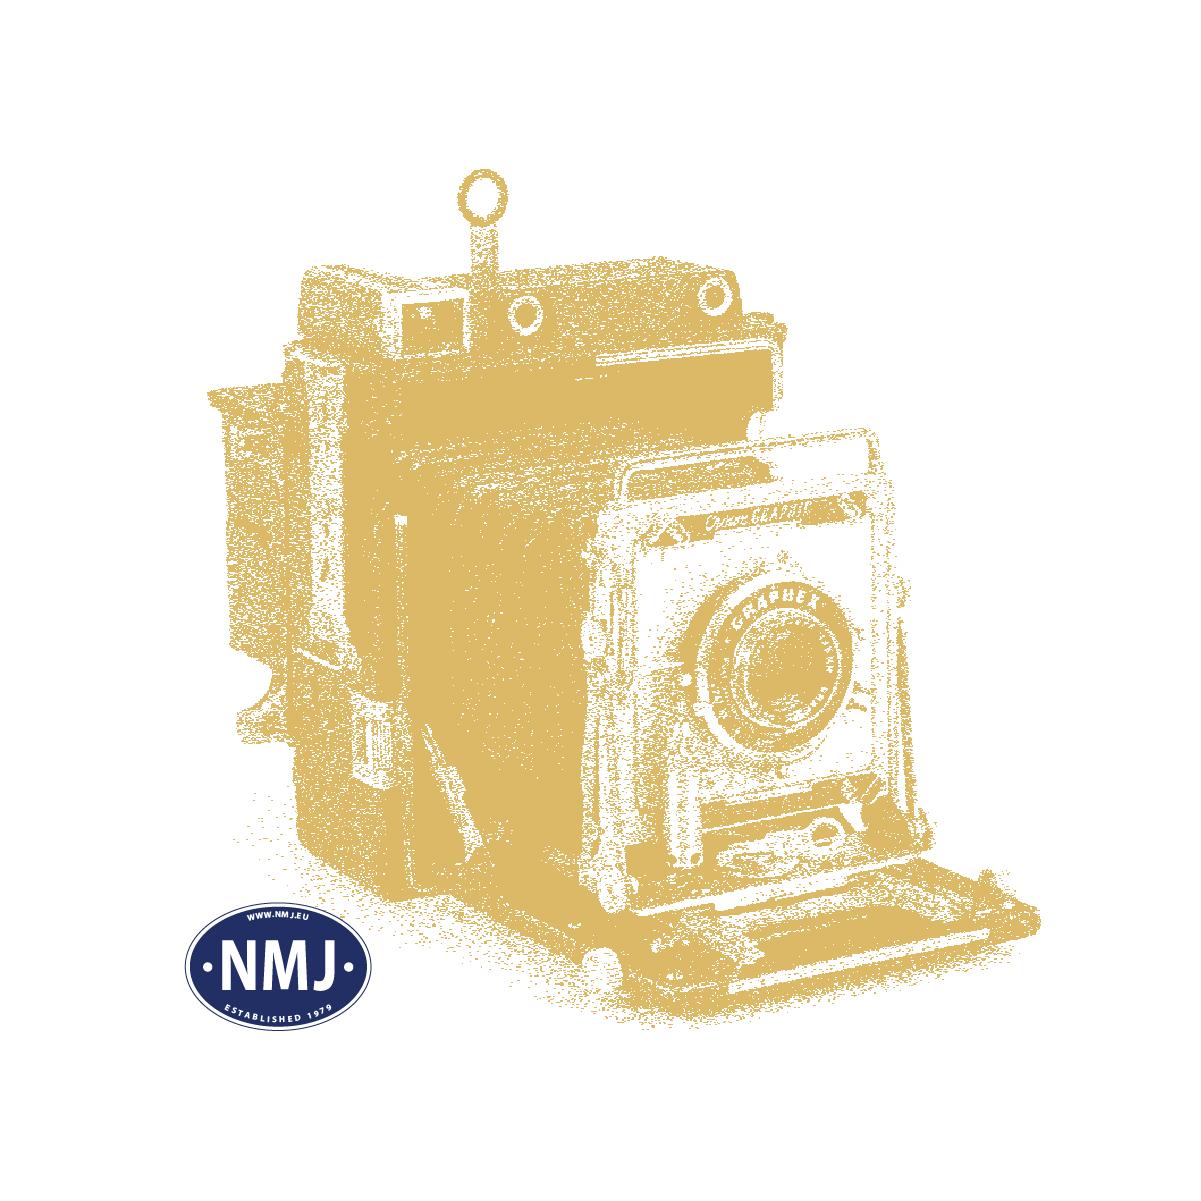 NMJT90304 - NMJ Topline CFL 1601 (1956-1971), DCC m/ Lyd